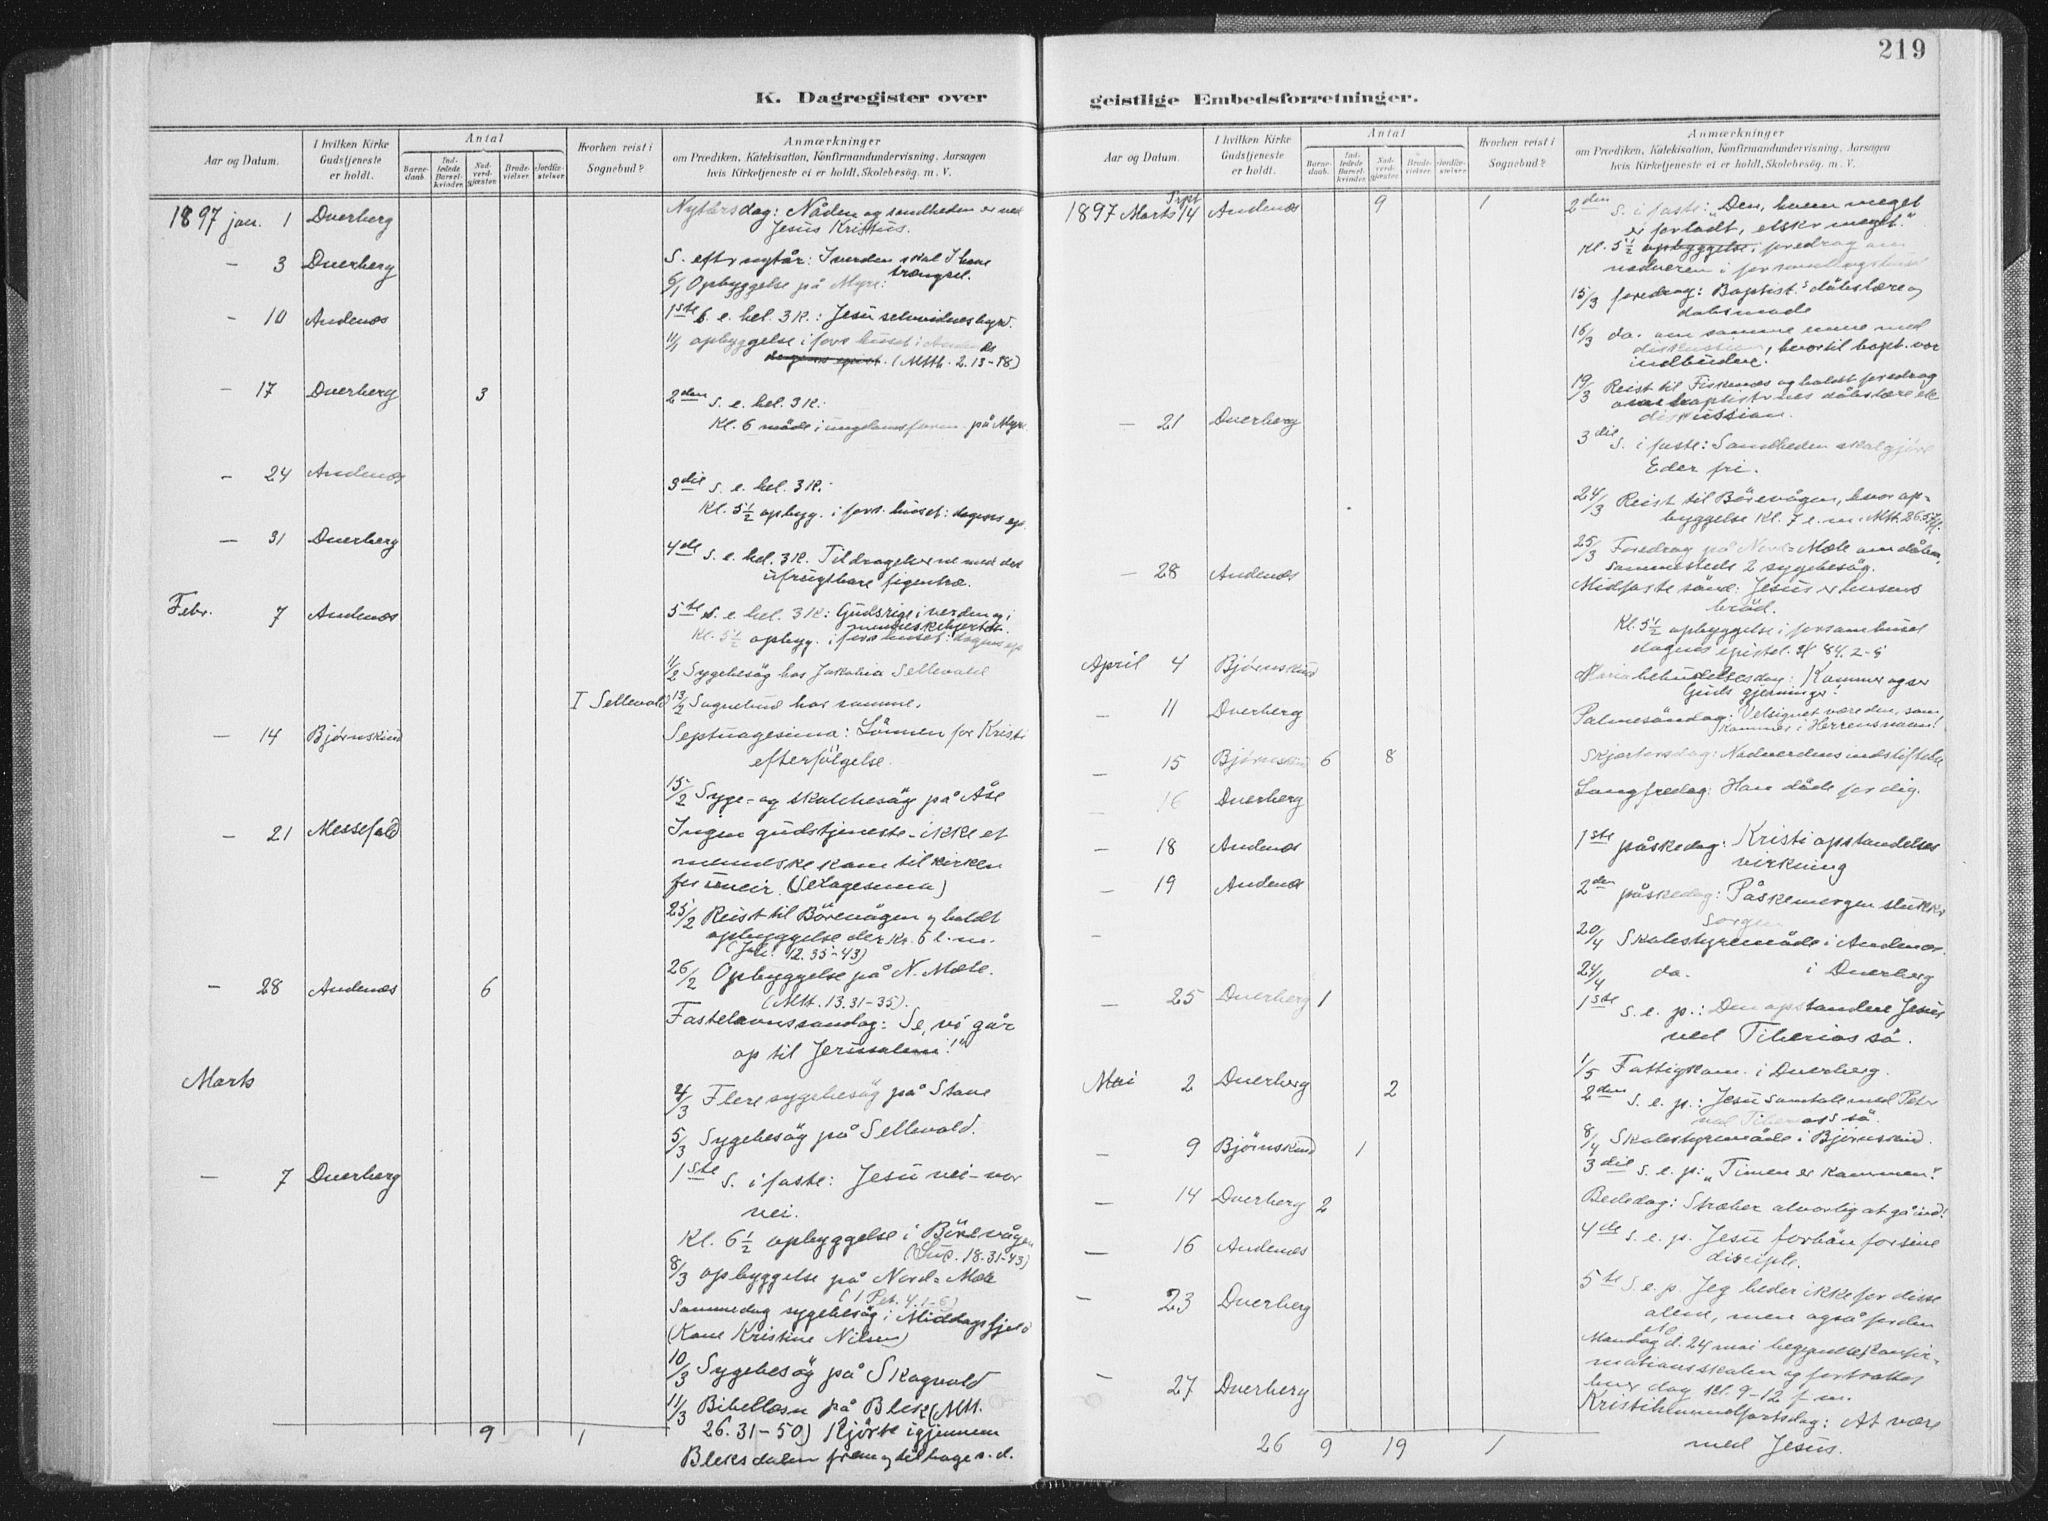 SAT, Ministerialprotokoller, klokkerbøker og fødselsregistre - Nordland, 897/L1400: Ministerialbok nr. 897A07, 1897-1908, s. 219